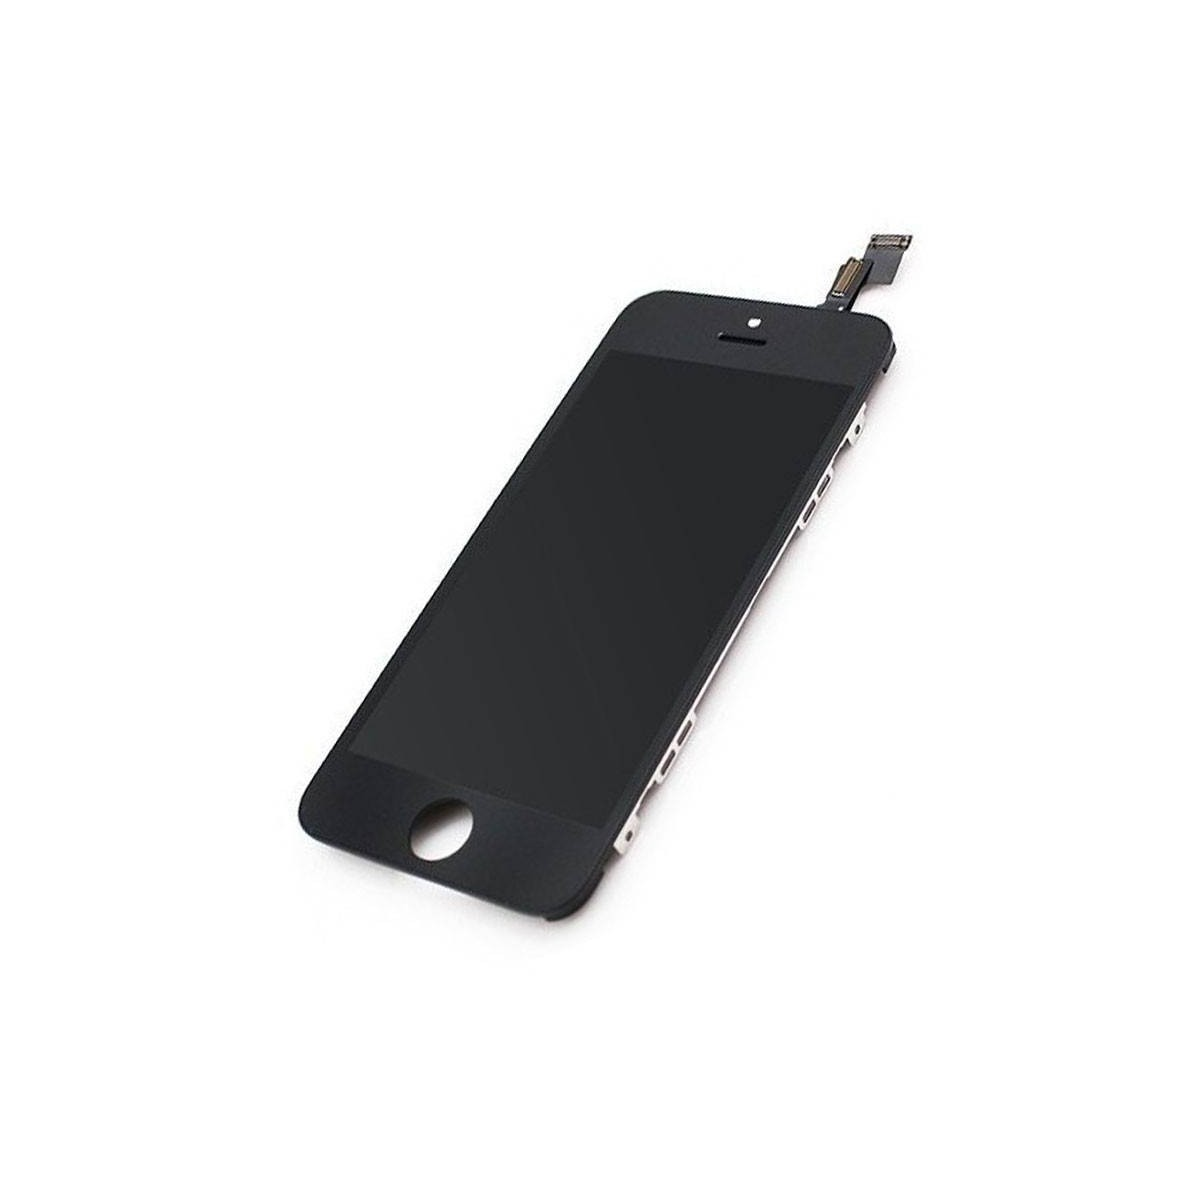 Ecrã completa iPhone 5s em cor preta